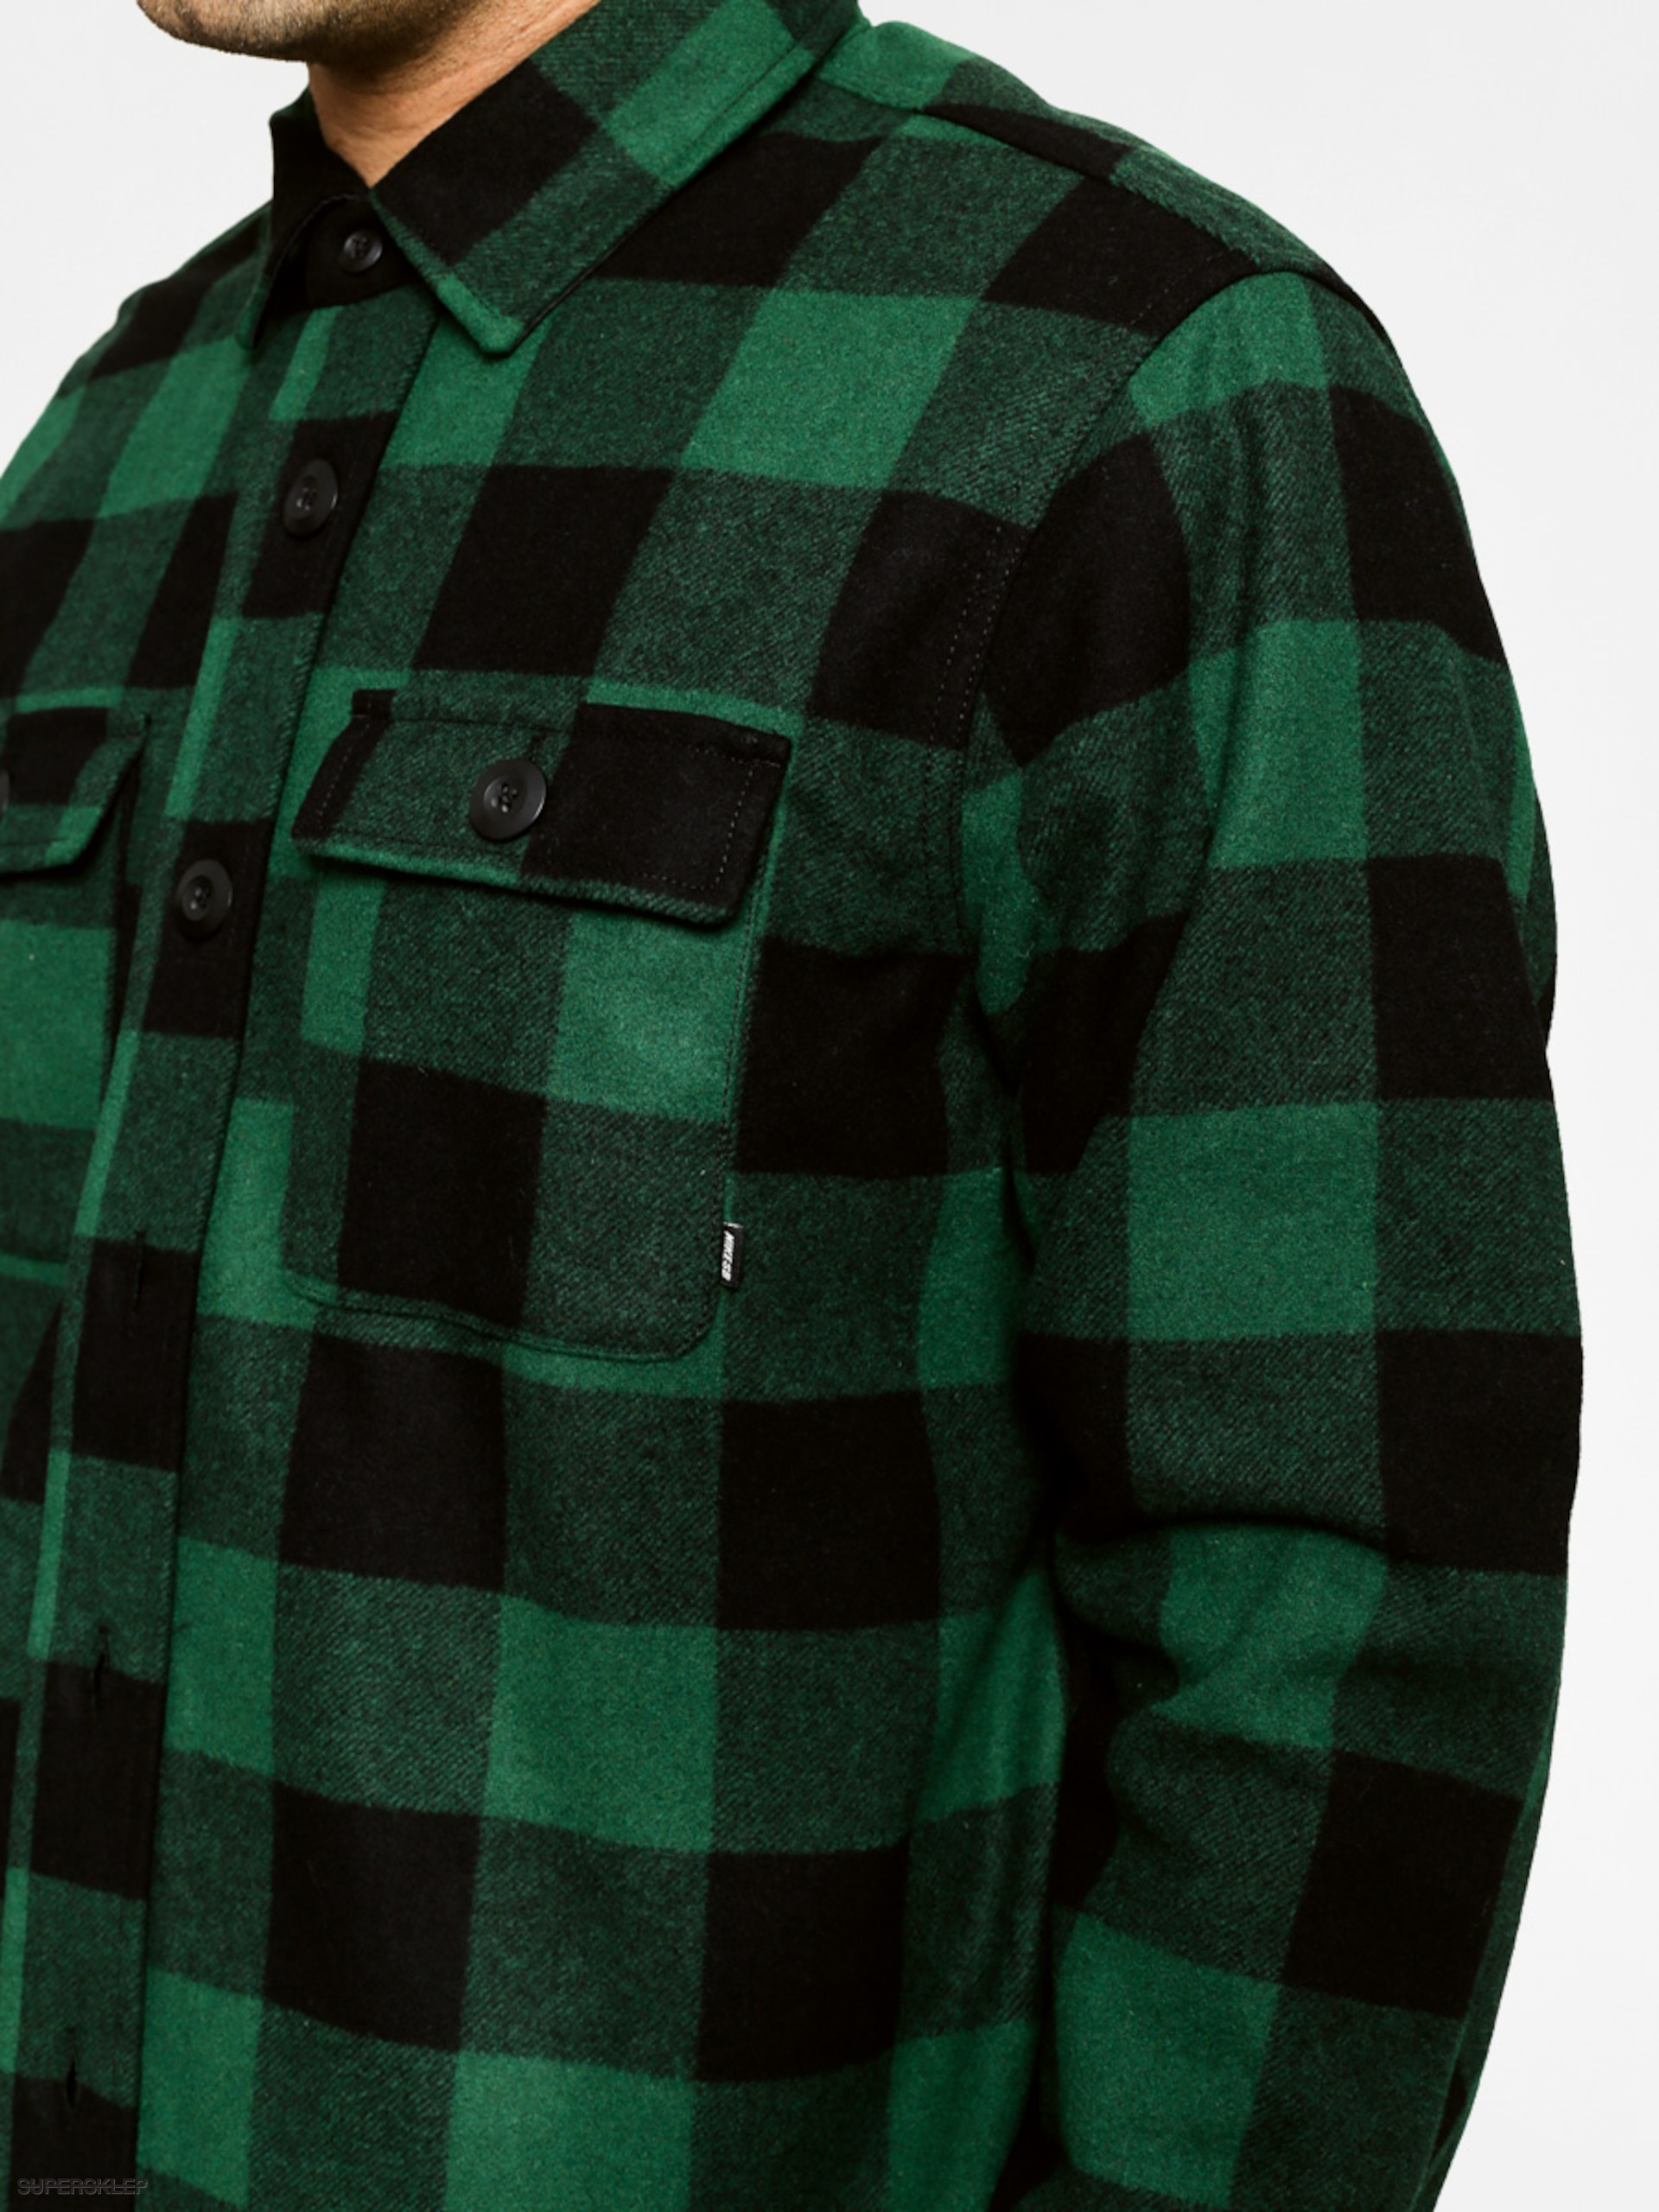 38127901094b8 Koszula Nike Holgate Wool LS (green)